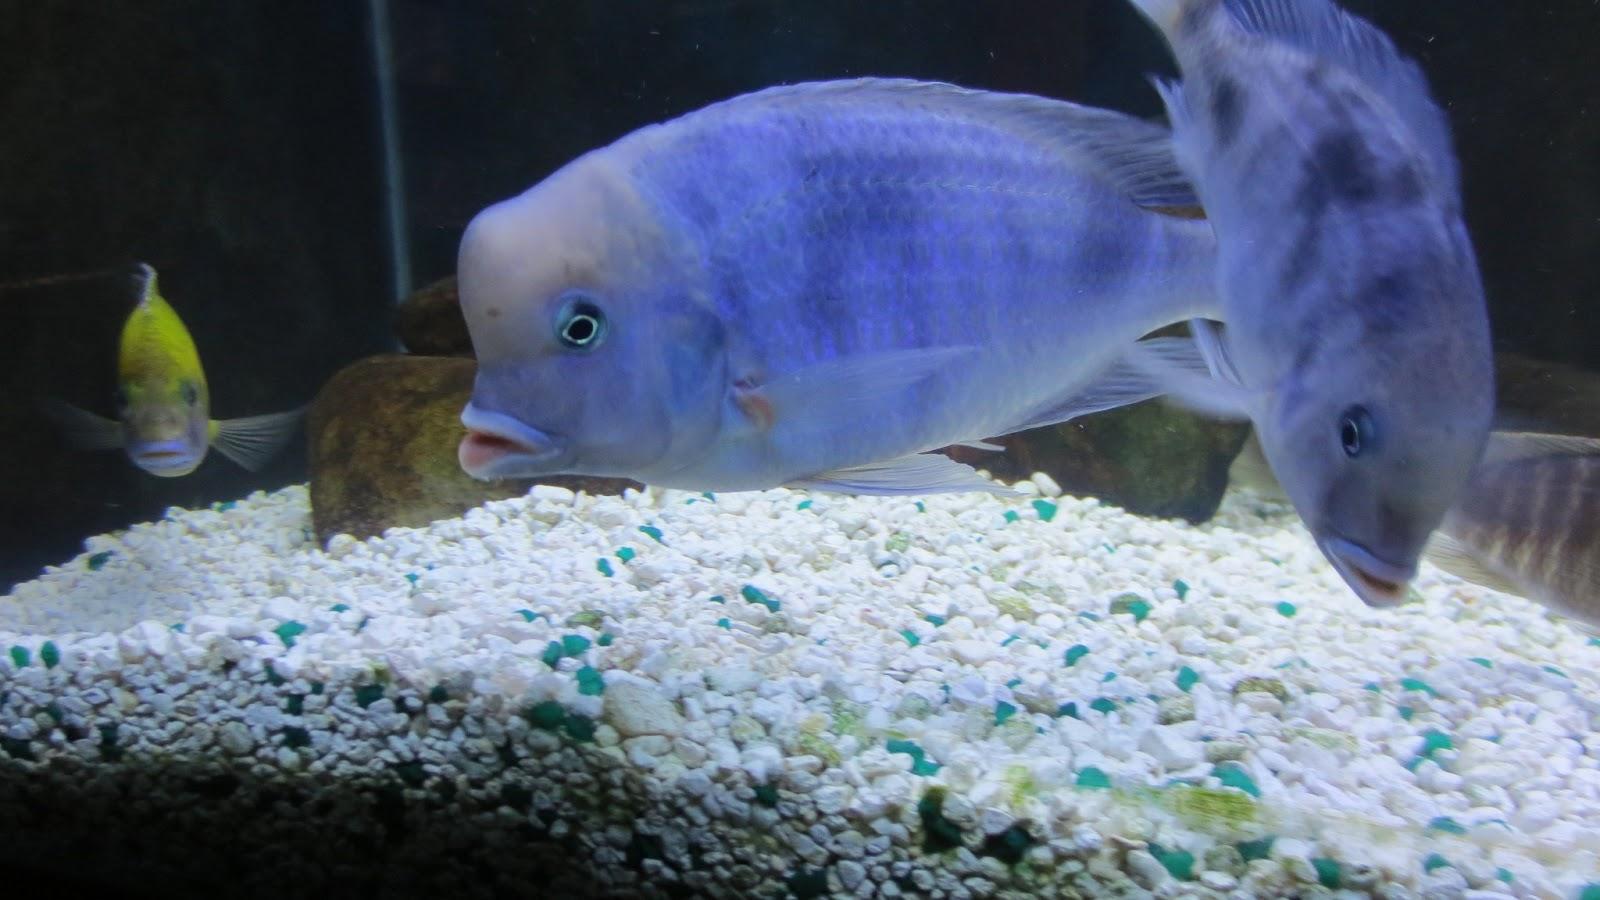 mal/tang fish: Cyrtocara moorii Blue Dolphin, 1-30-13